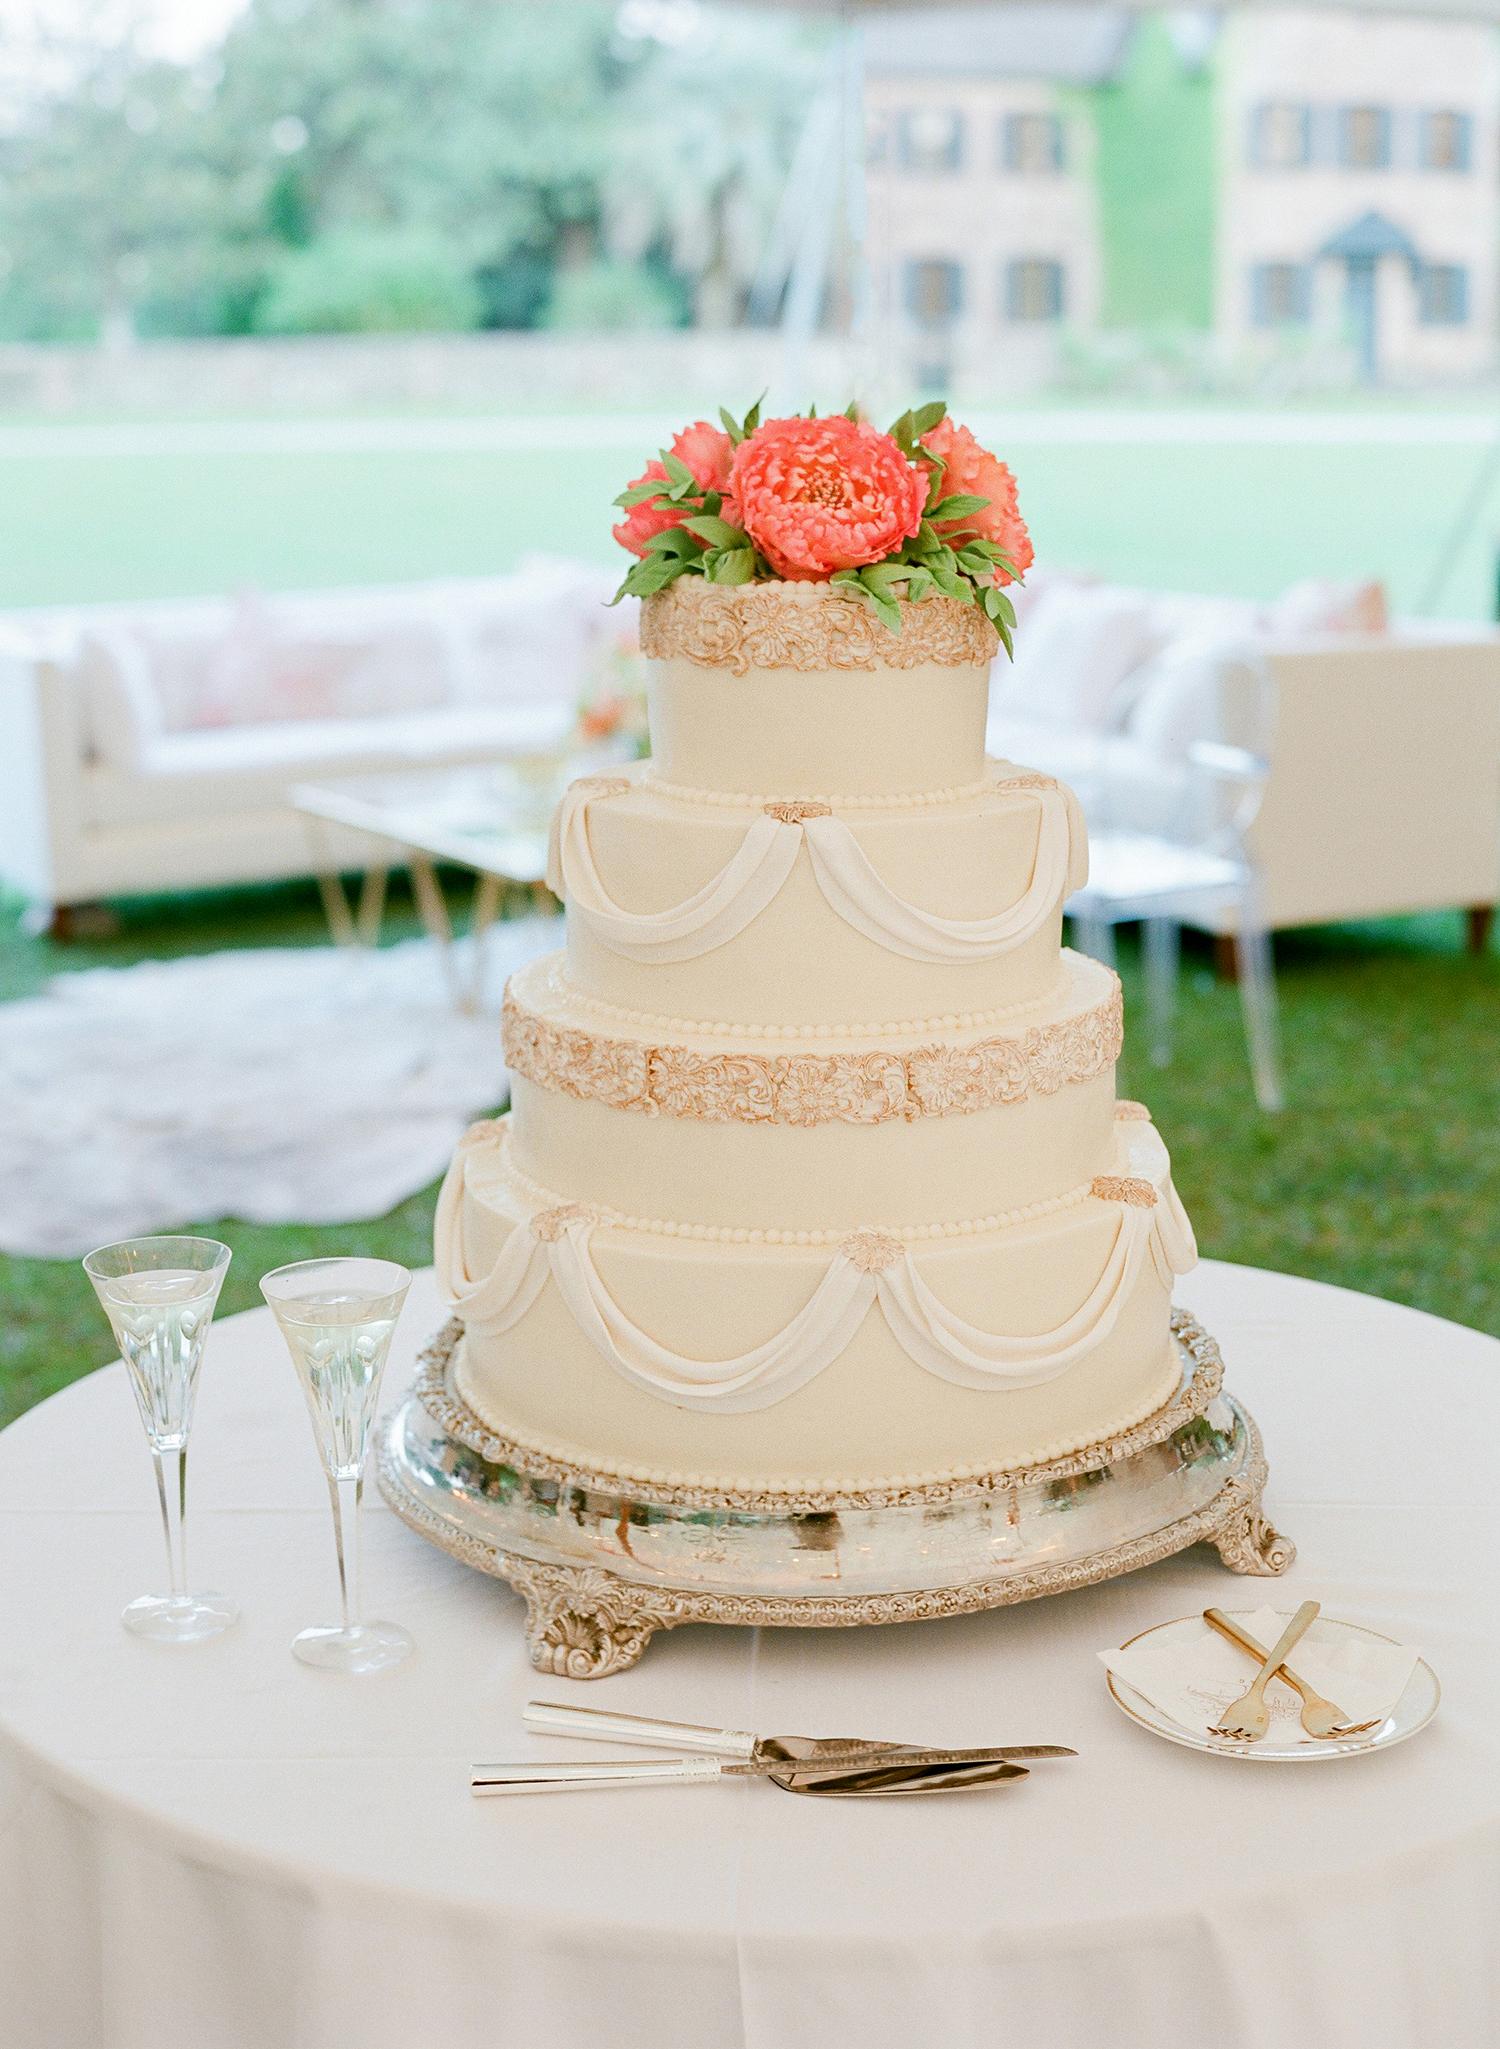 giordana and geoffrey wedding cake